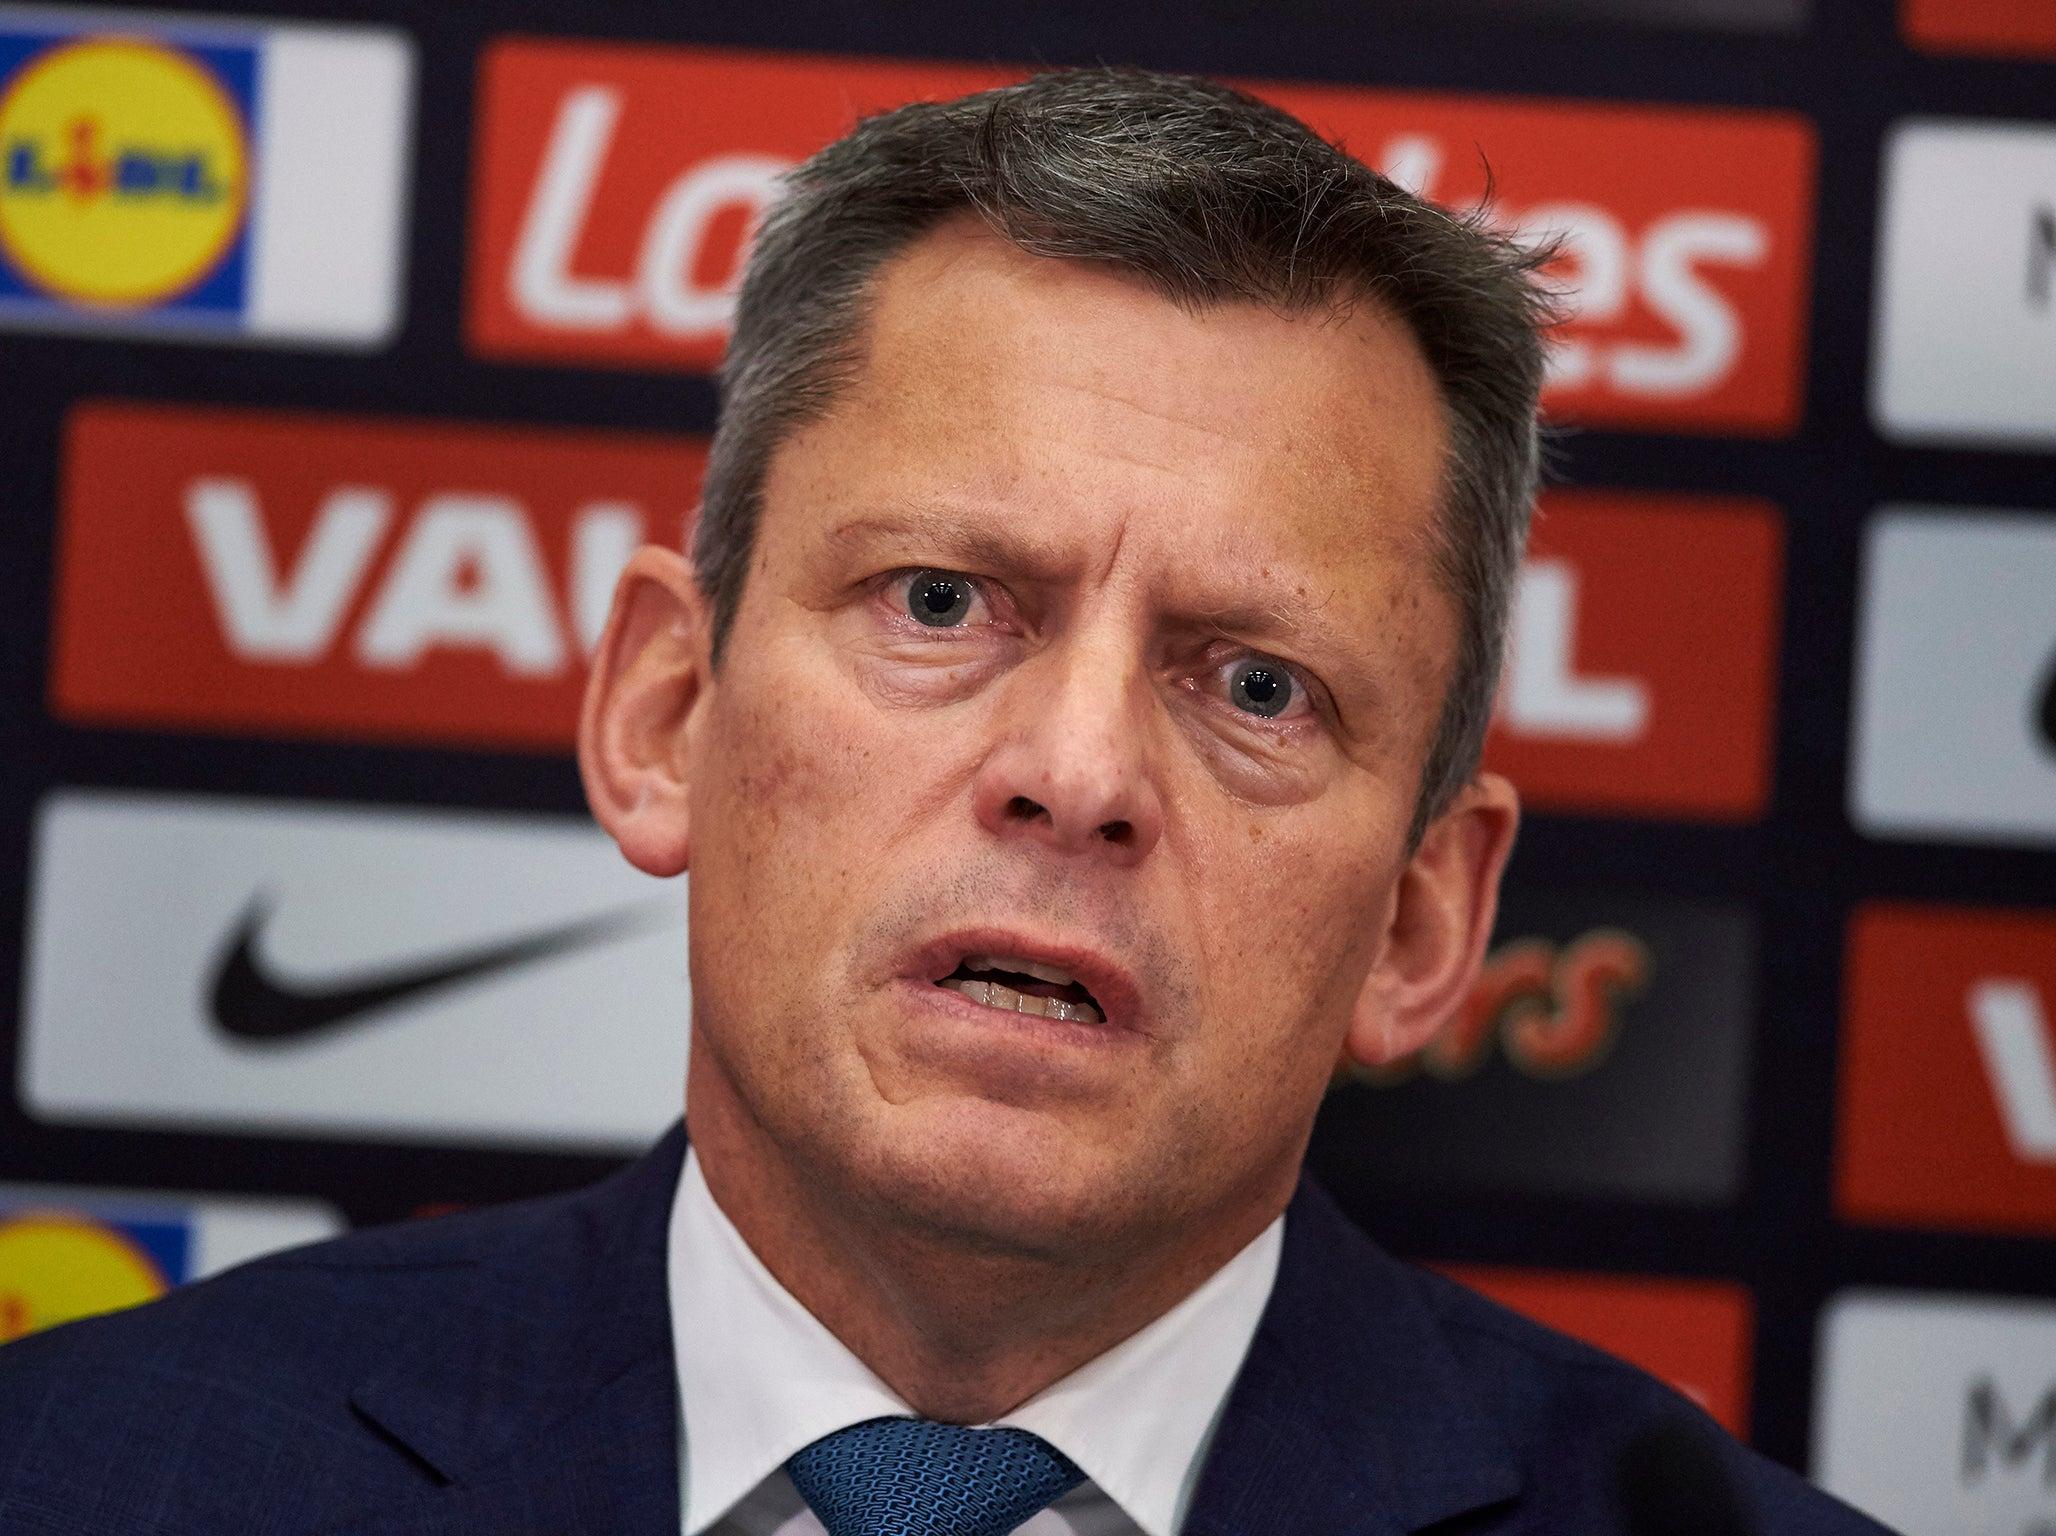 Football Association chief executive Martin Glenn apologises for comparing Star of David to Nazi swastika